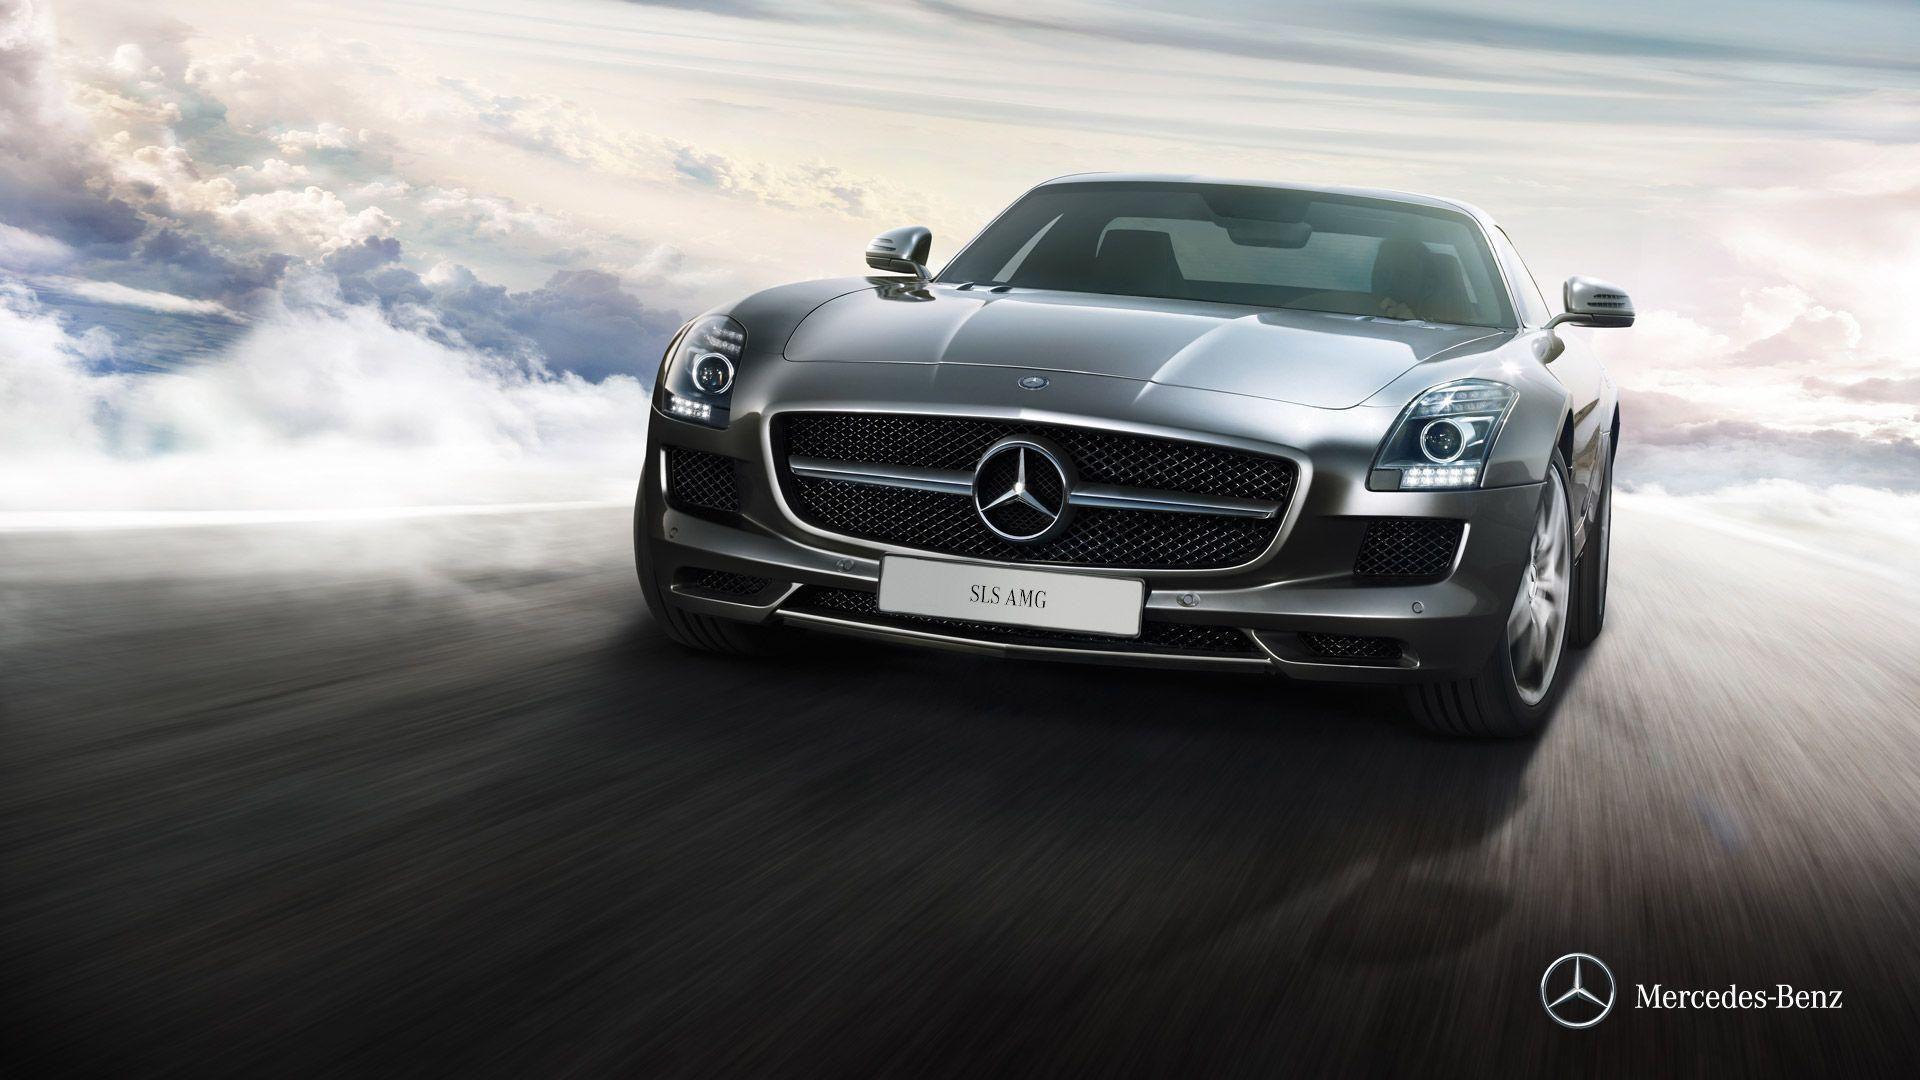 Mercedes-Benz HD Wallpapers - Top Free